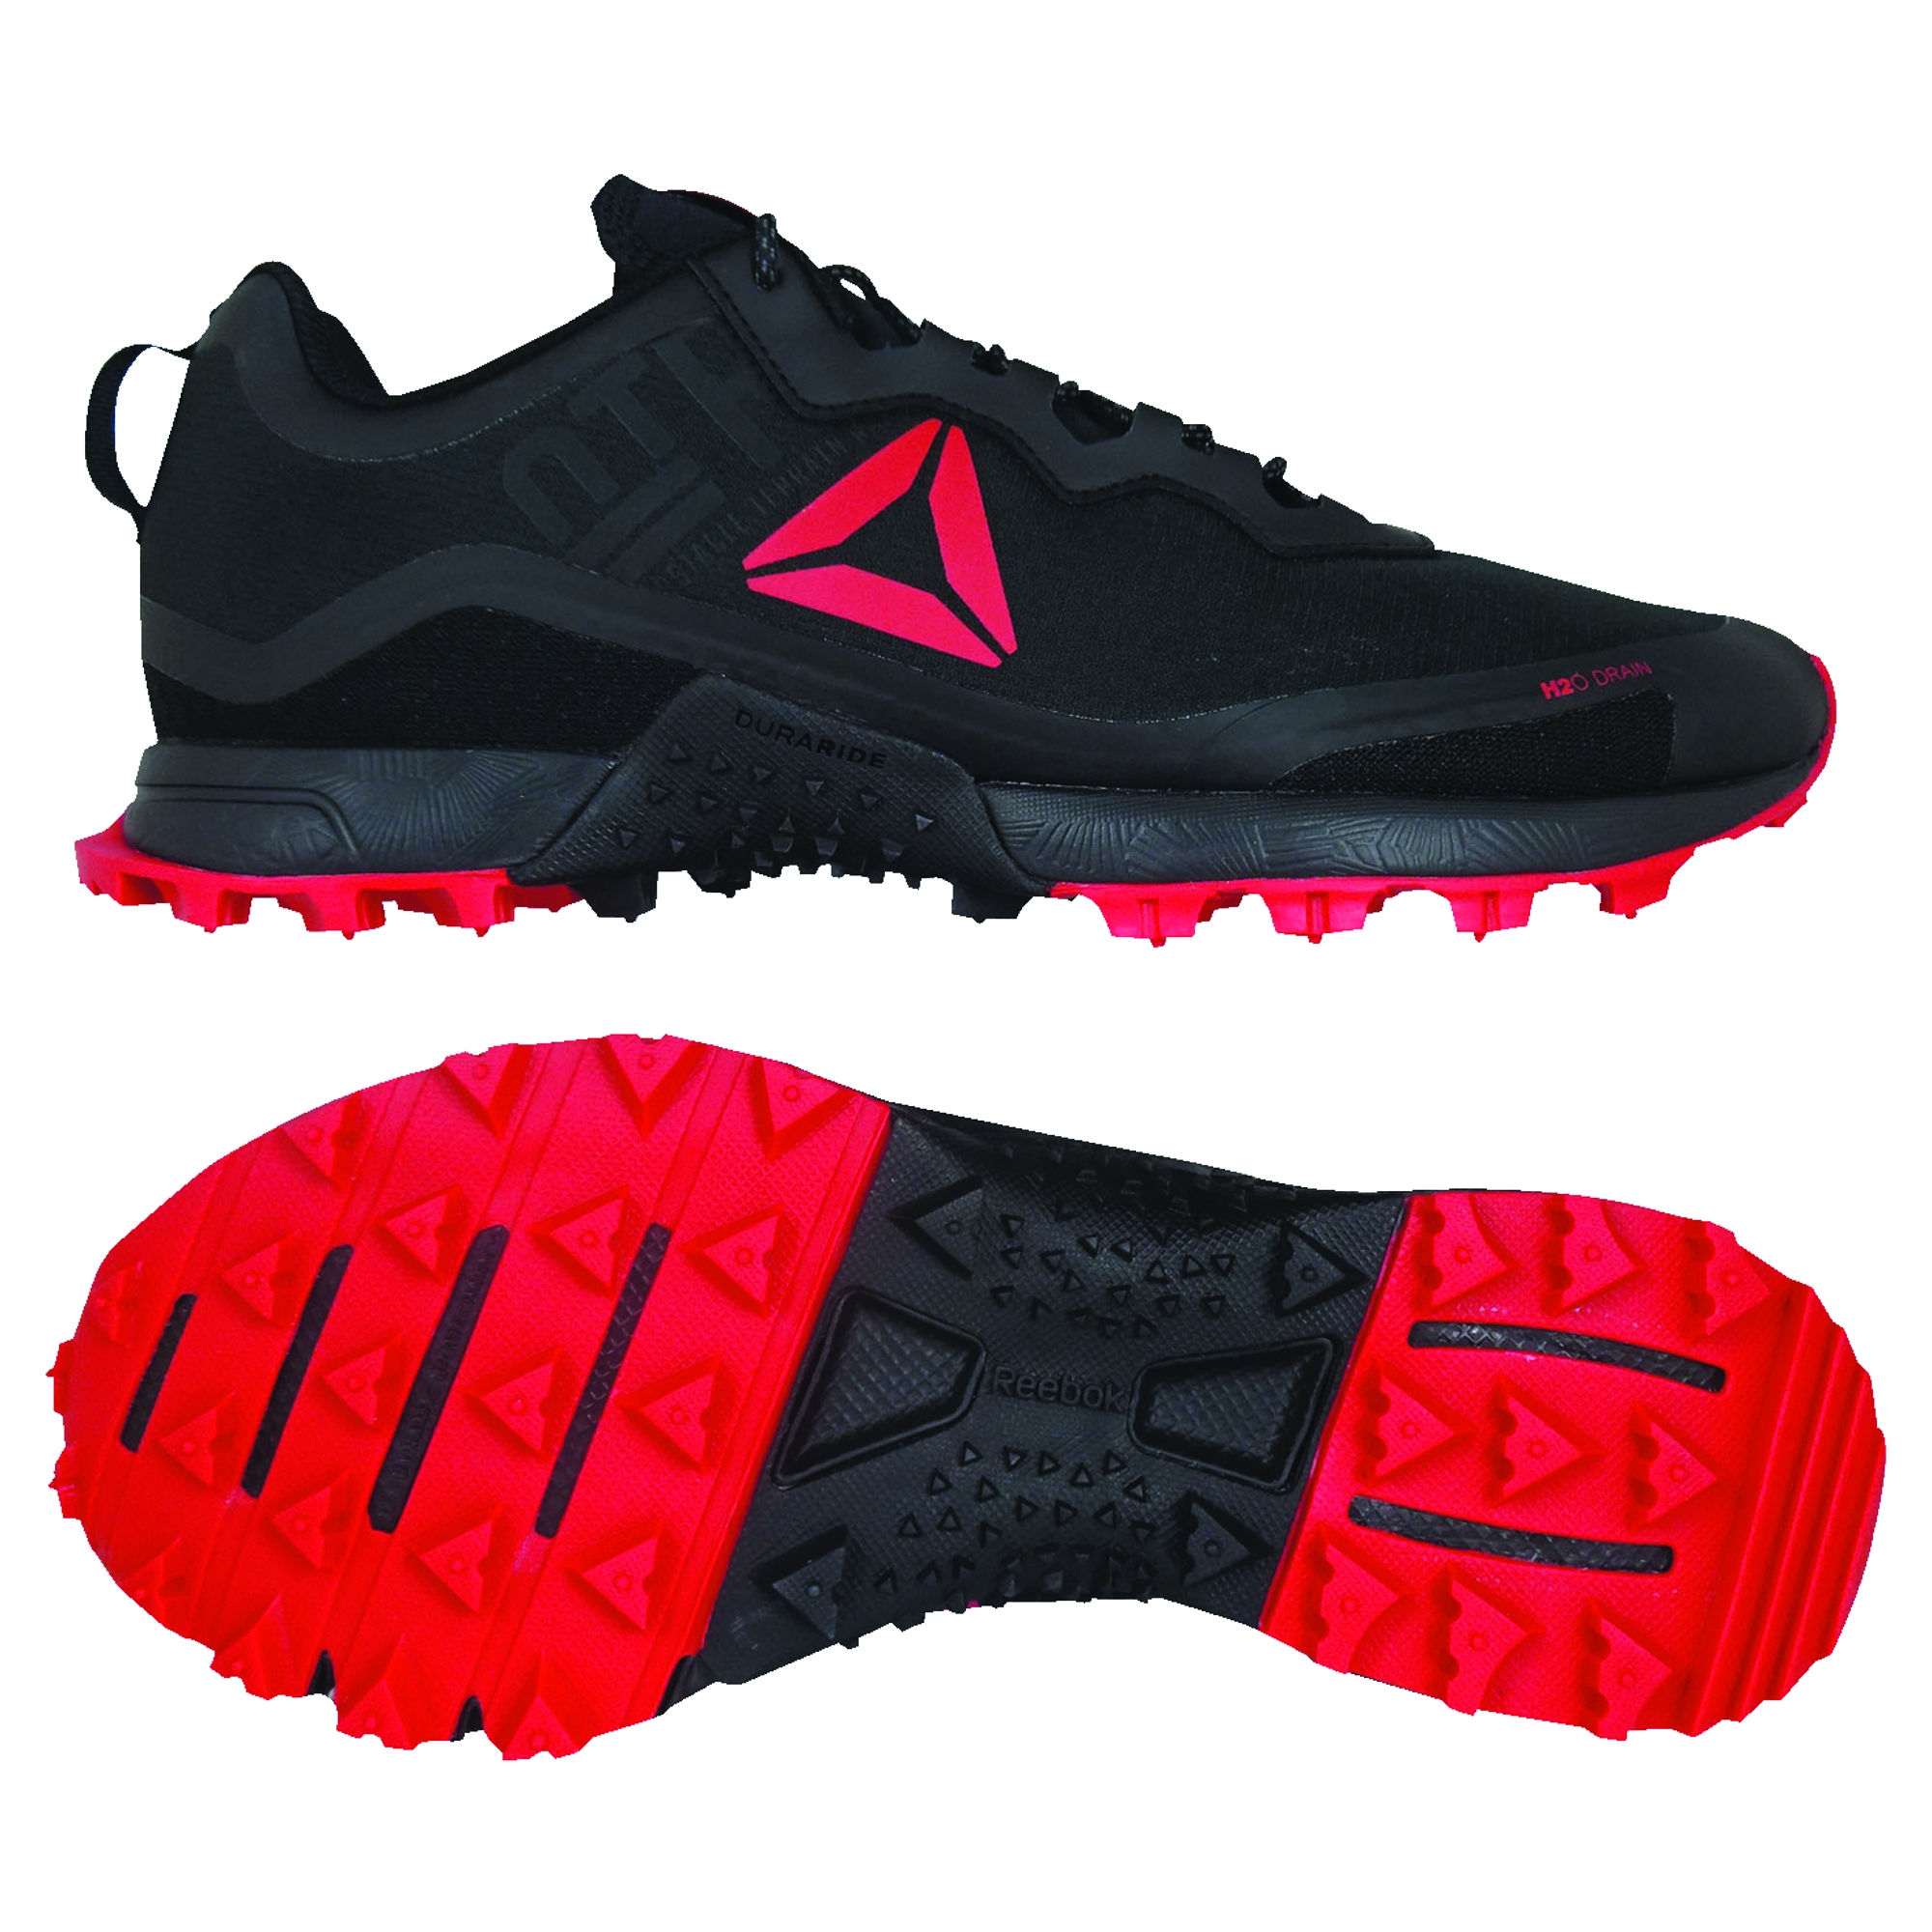 best online incredible prices wholesale sales Chaussures Reebok All Terrain Craze